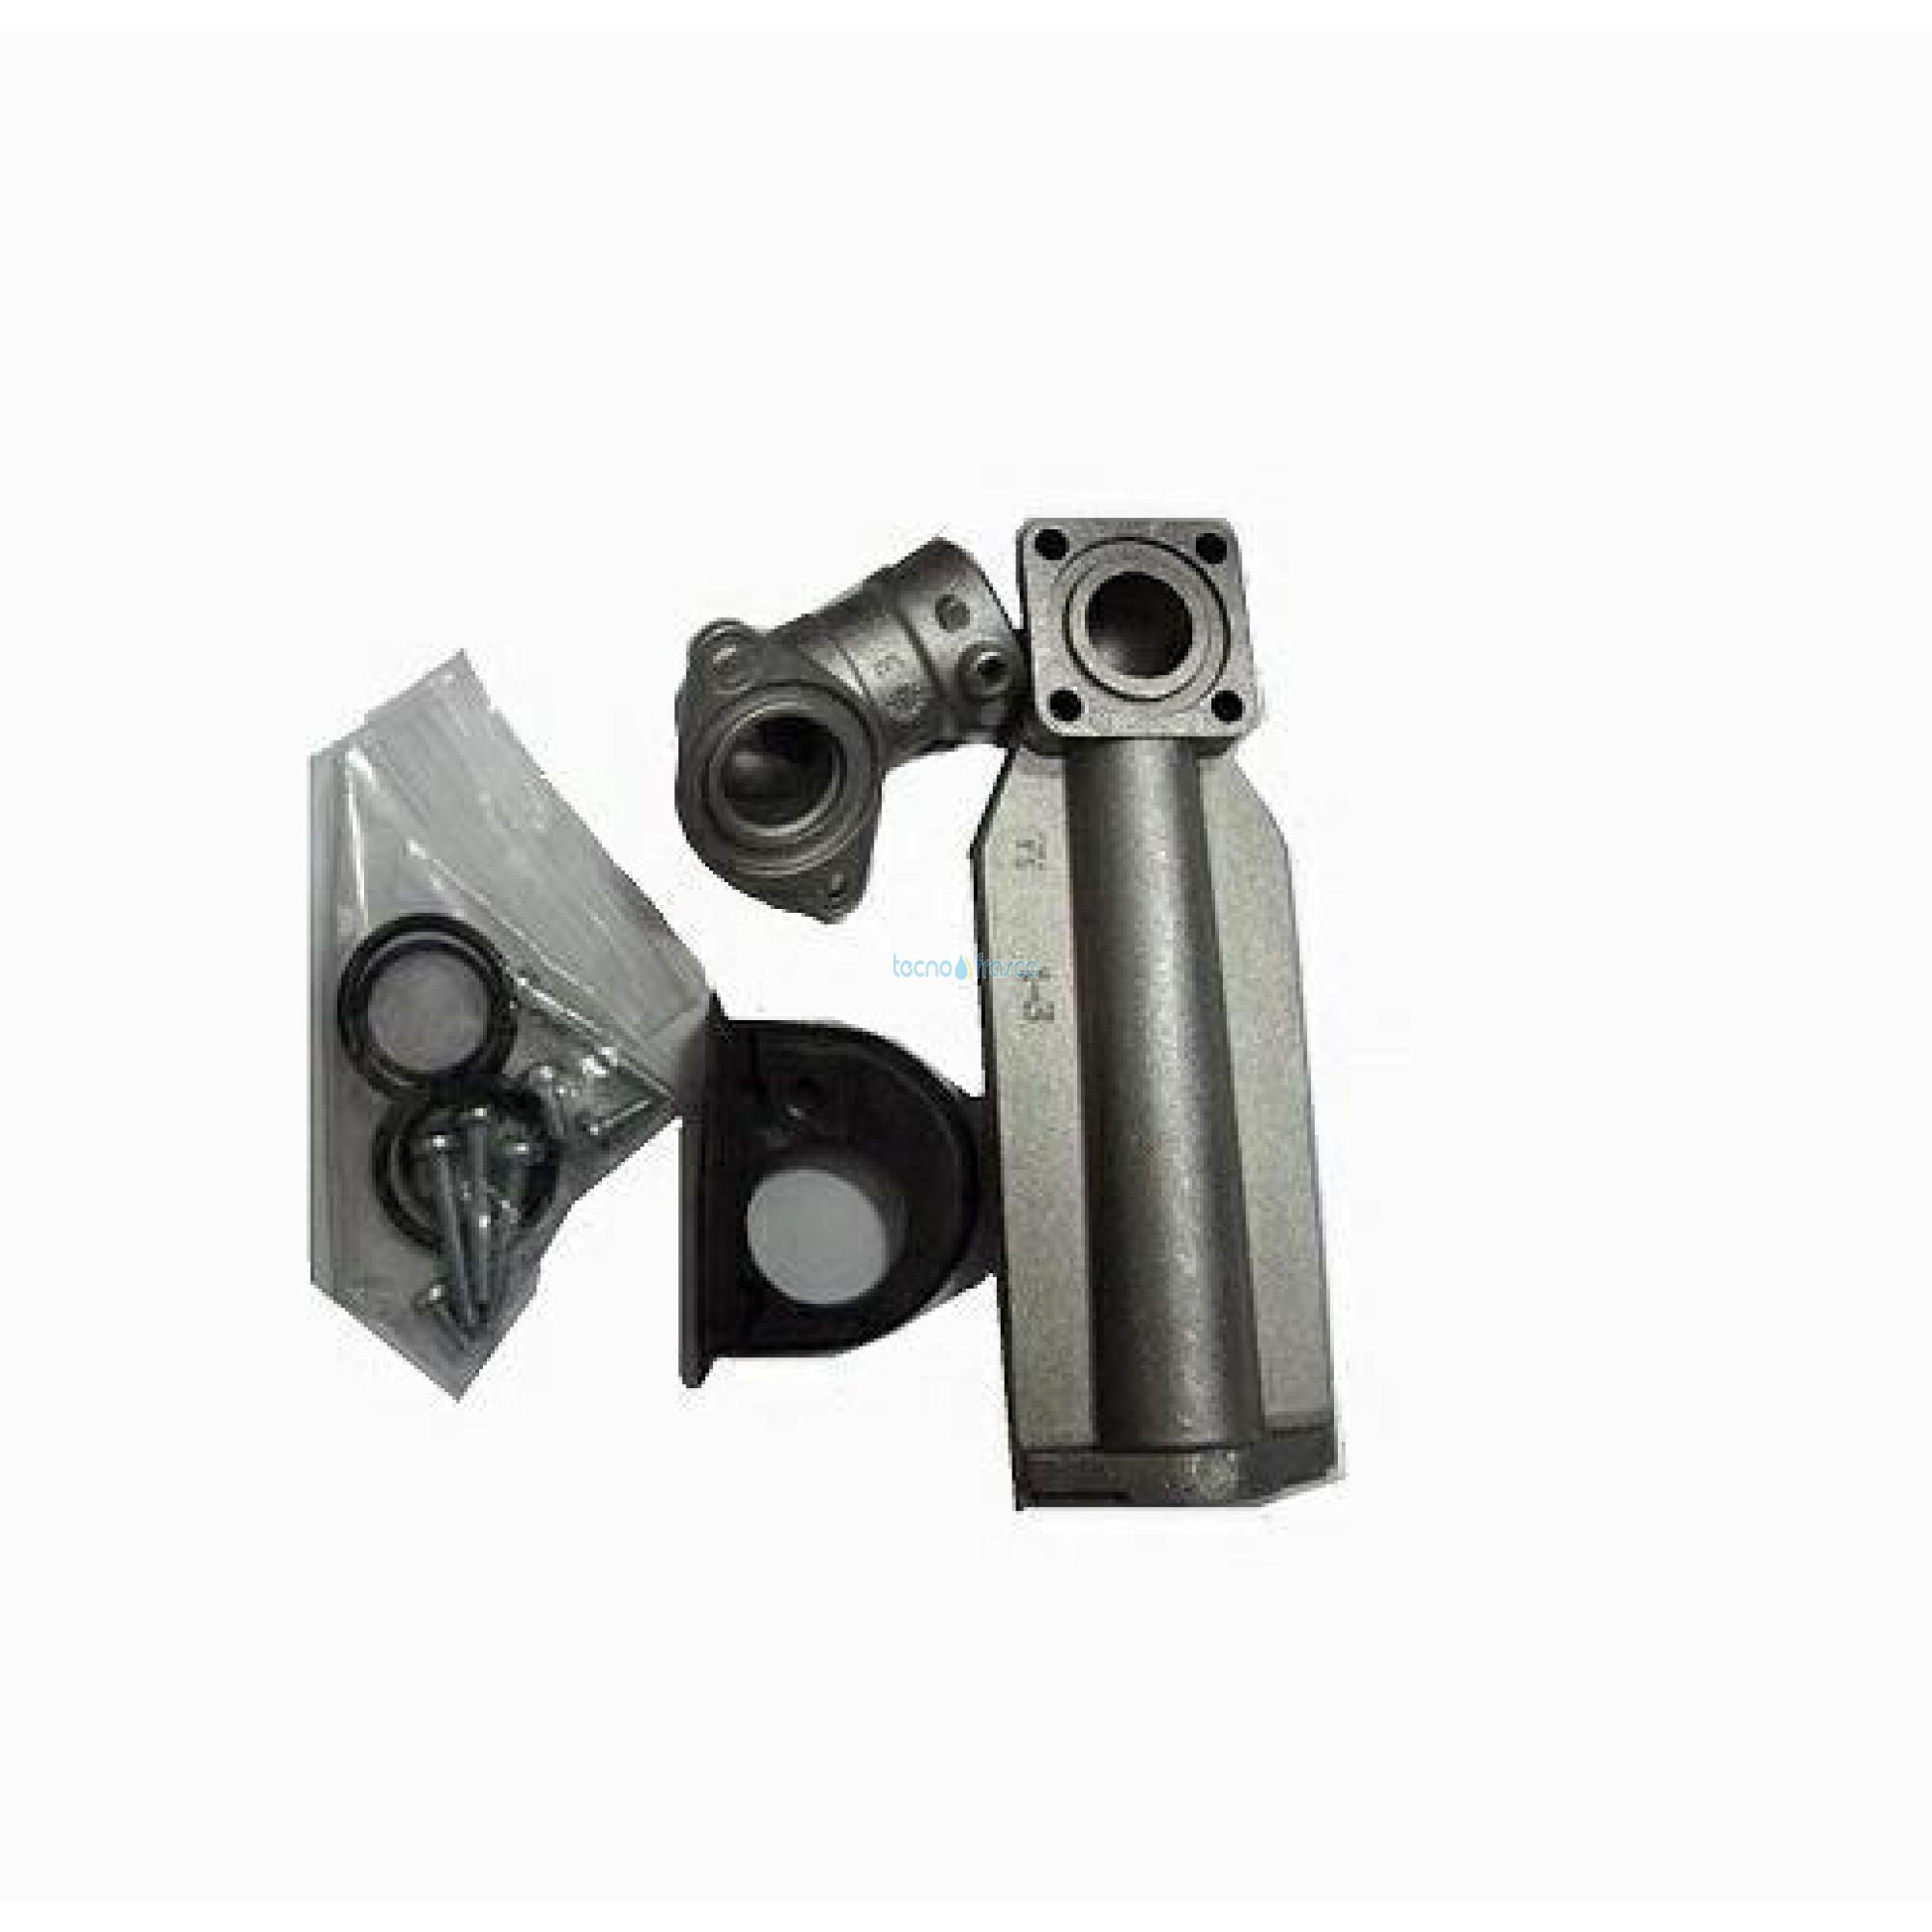 Ariston tubo valvola gas bruciatore 65104230